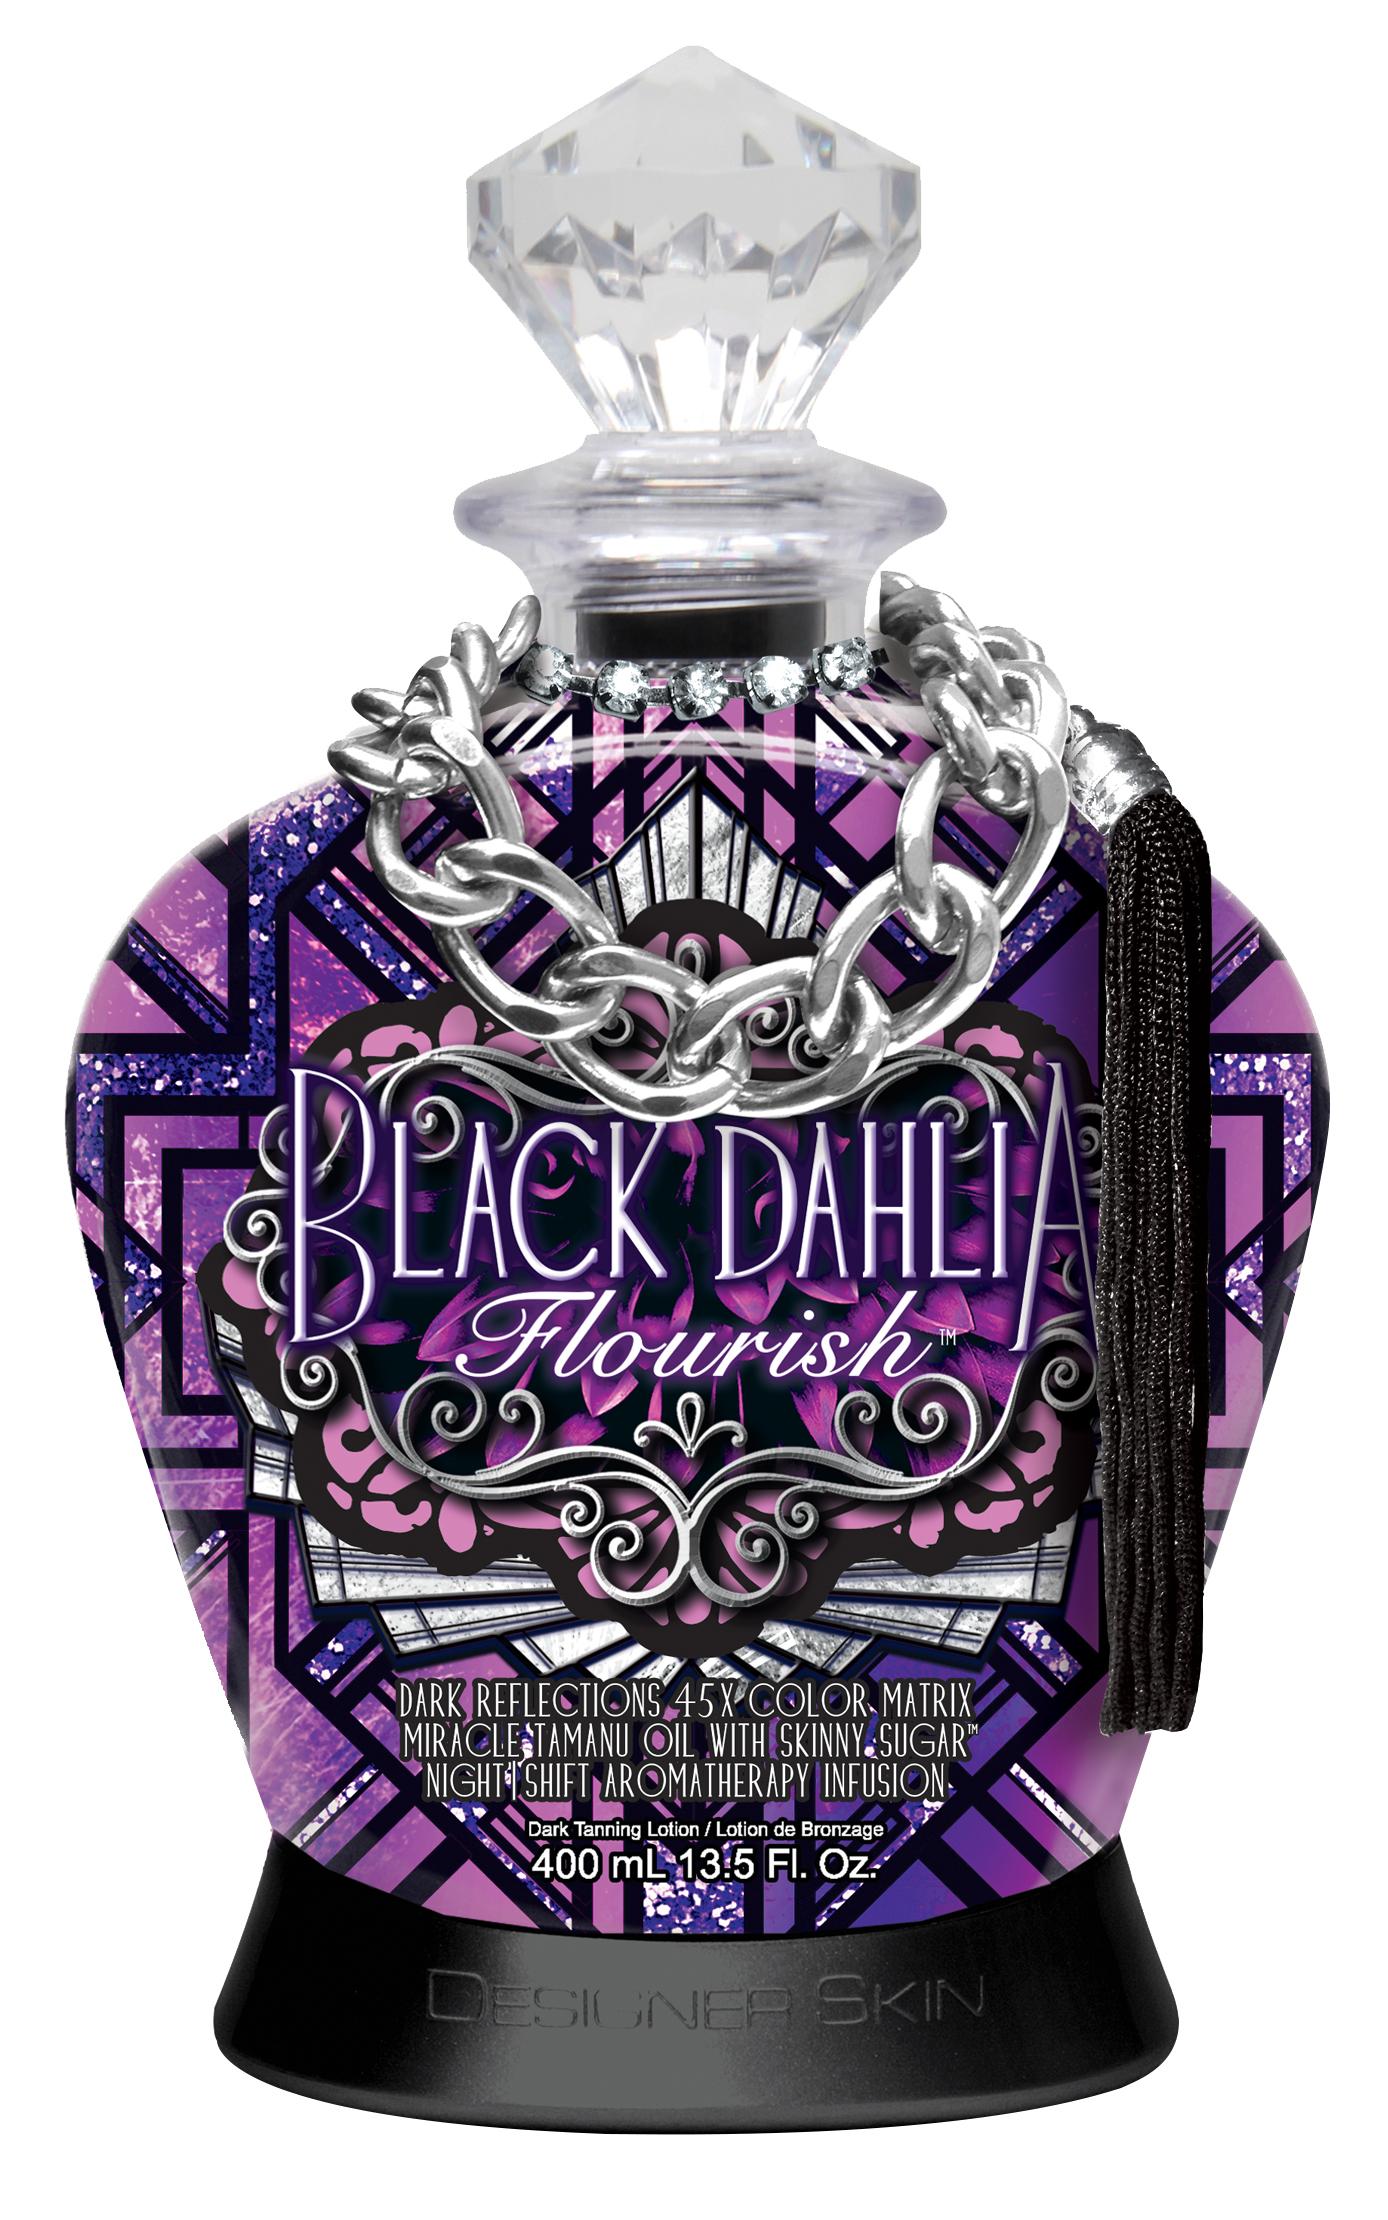 Black Dahlia Flourish™ Dark Reflections 45X Color Matrix